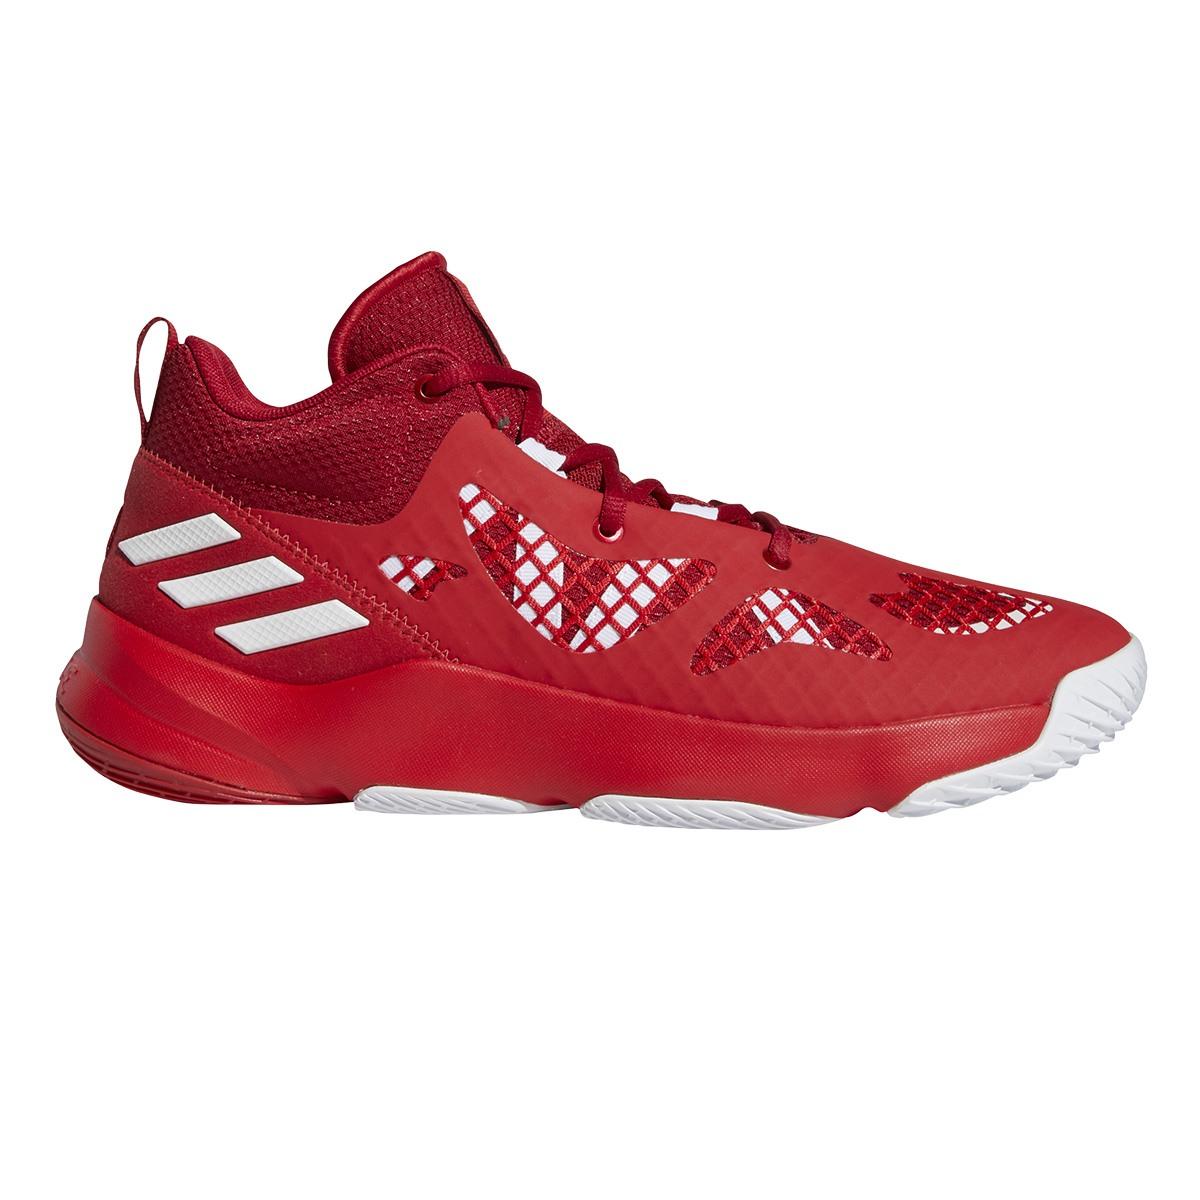 Tênis Adidas Pro Next 2021 Masculino